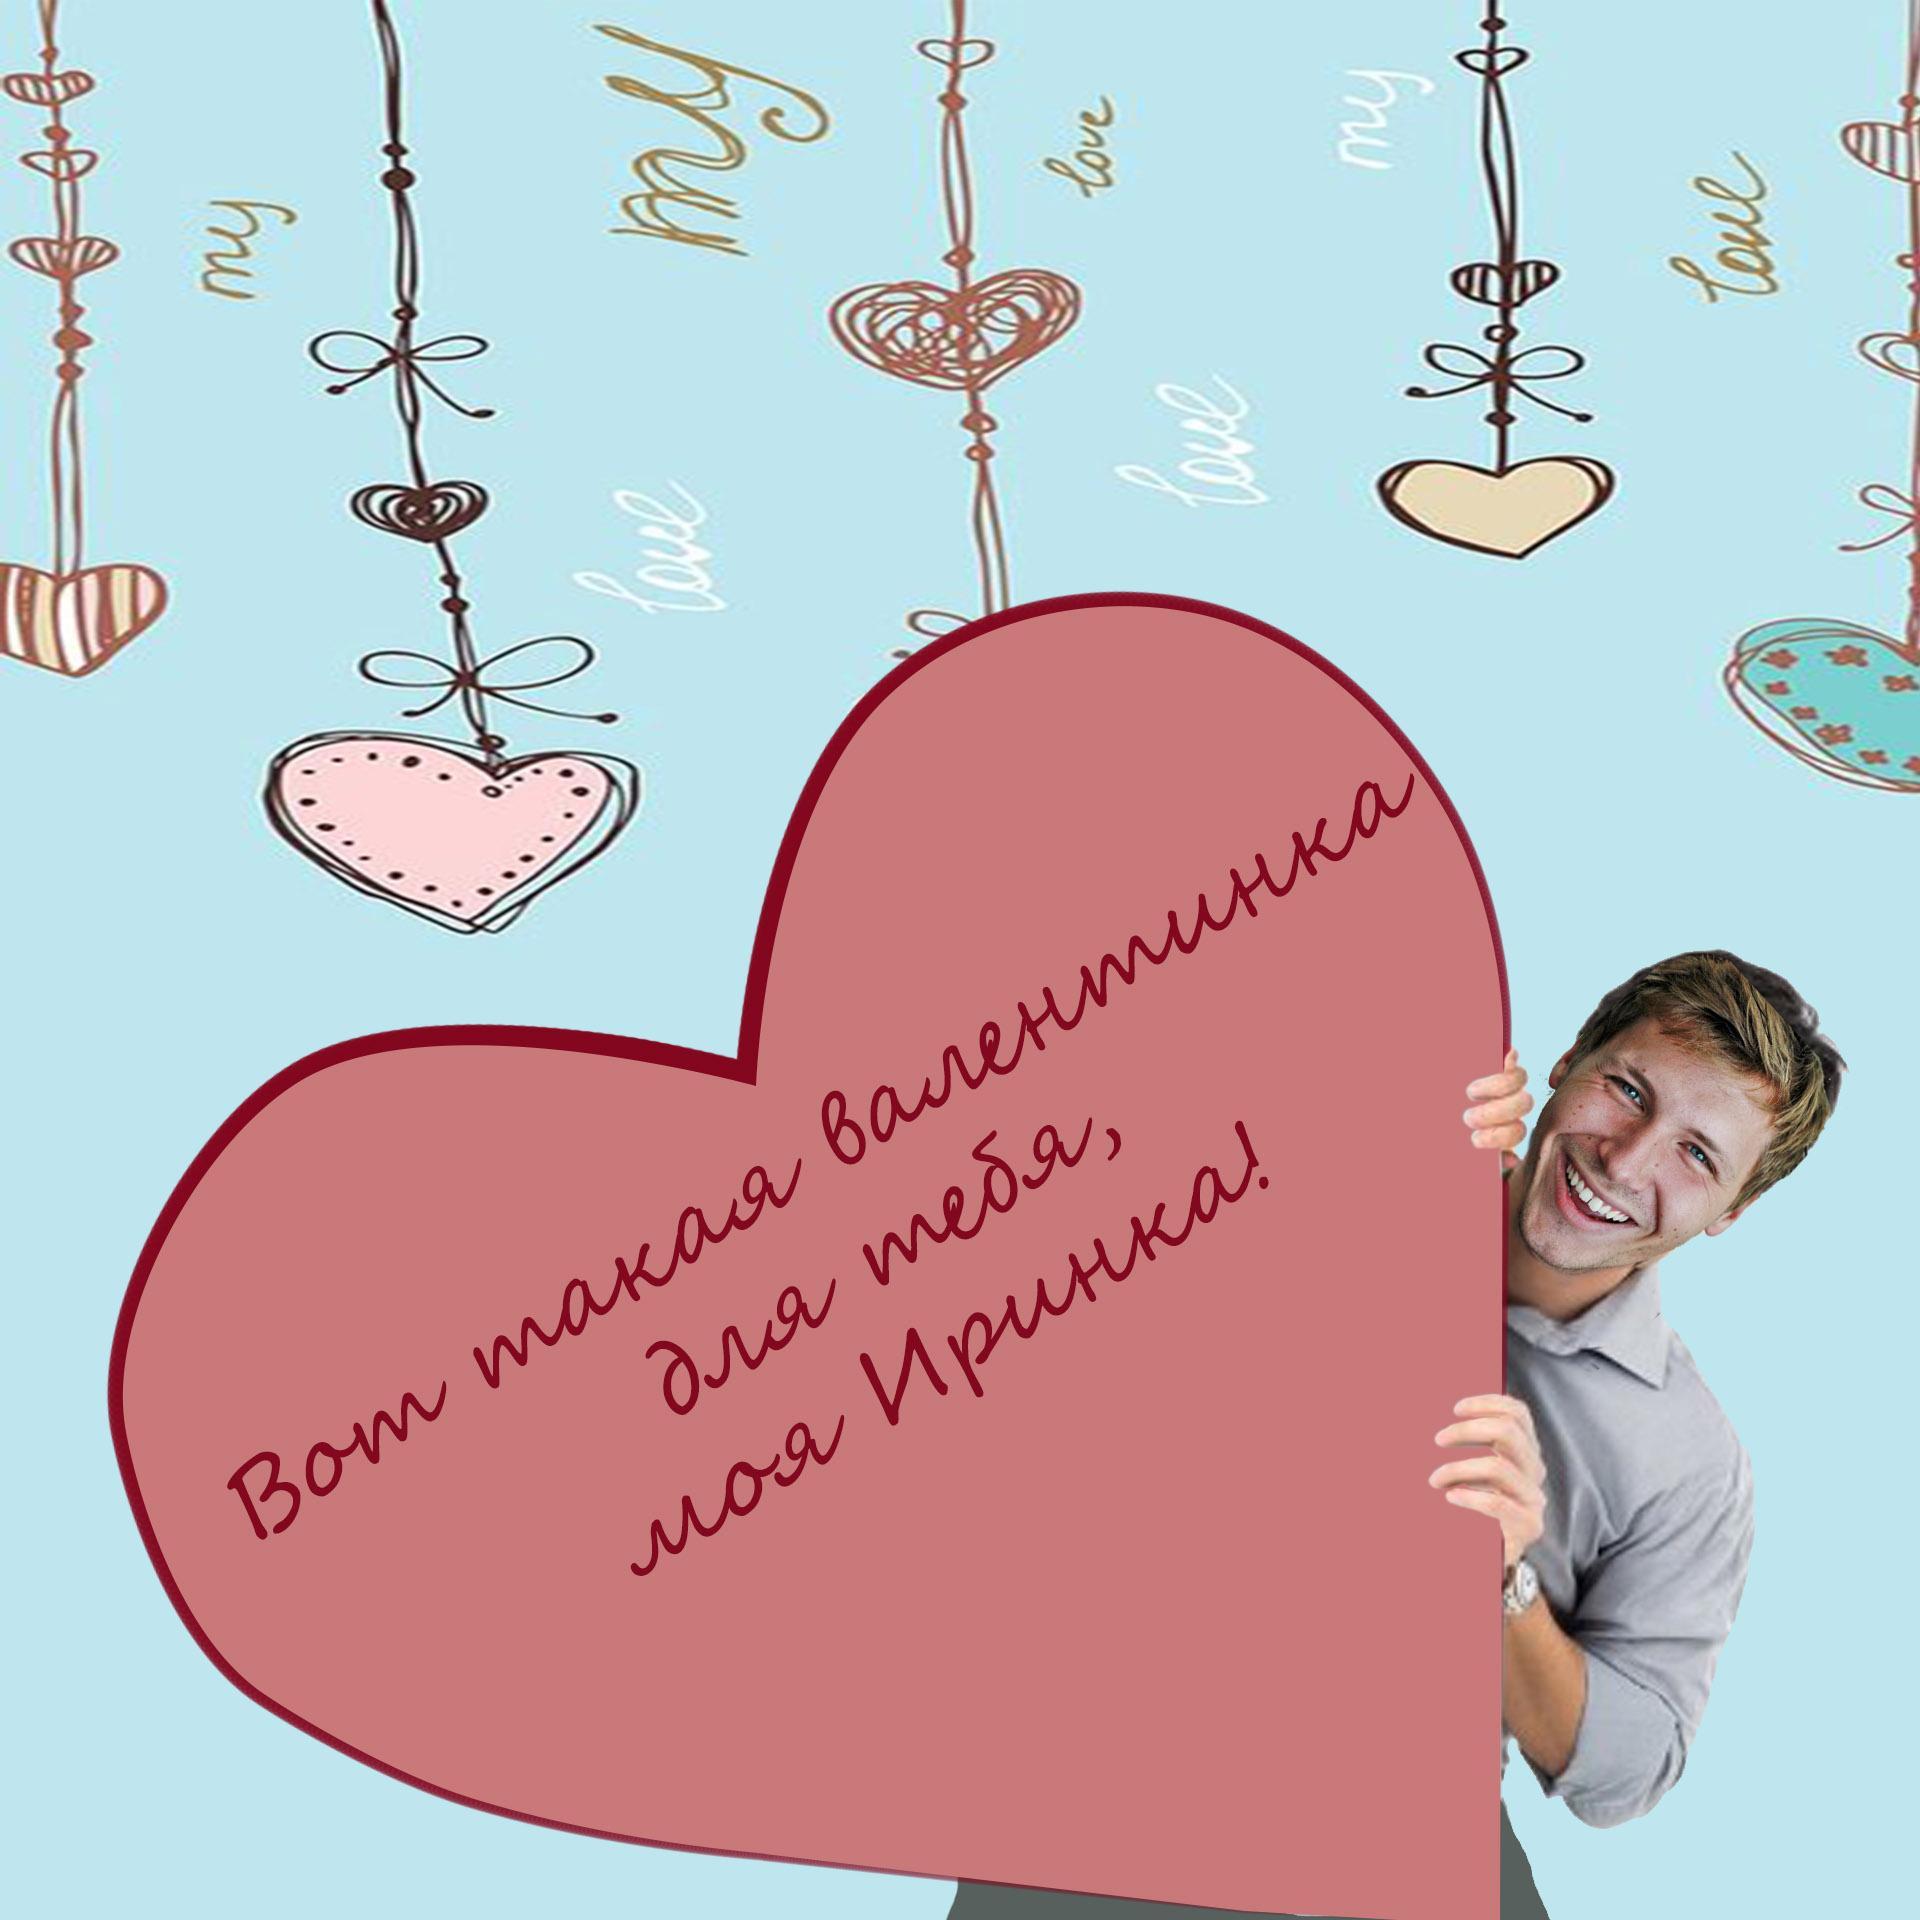 валентинка для любимой, открытка для девушки, необычная открытка для девушки, открытка на заказ, открытка с днем святого валентина, валентинка для жены, валентинка на заказ.